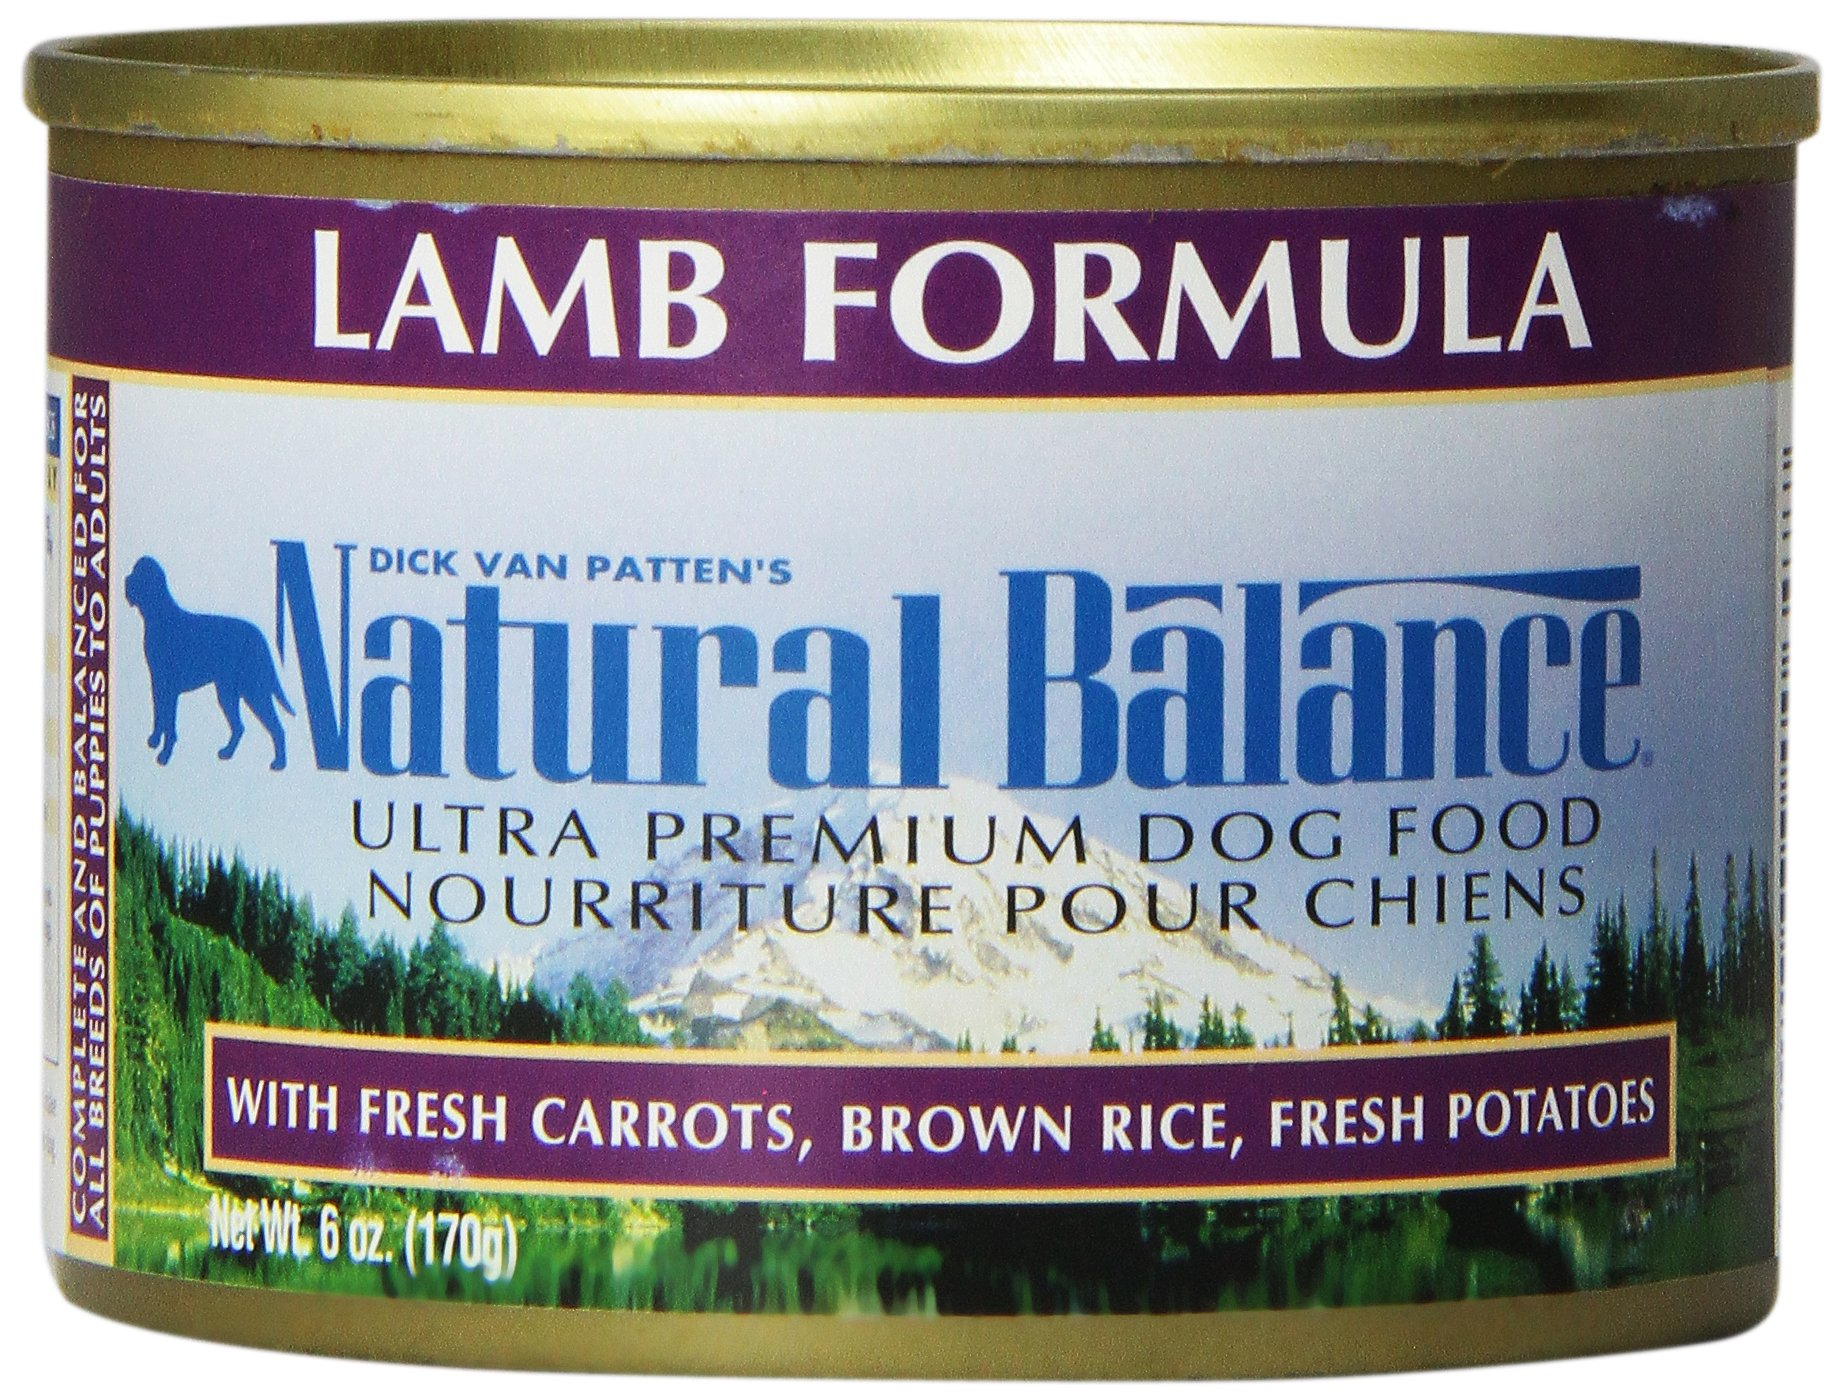 Natural Balance Ultra Premium Canned Dog Food, Lamb Formula, 6-Ounce (Pack of 12)